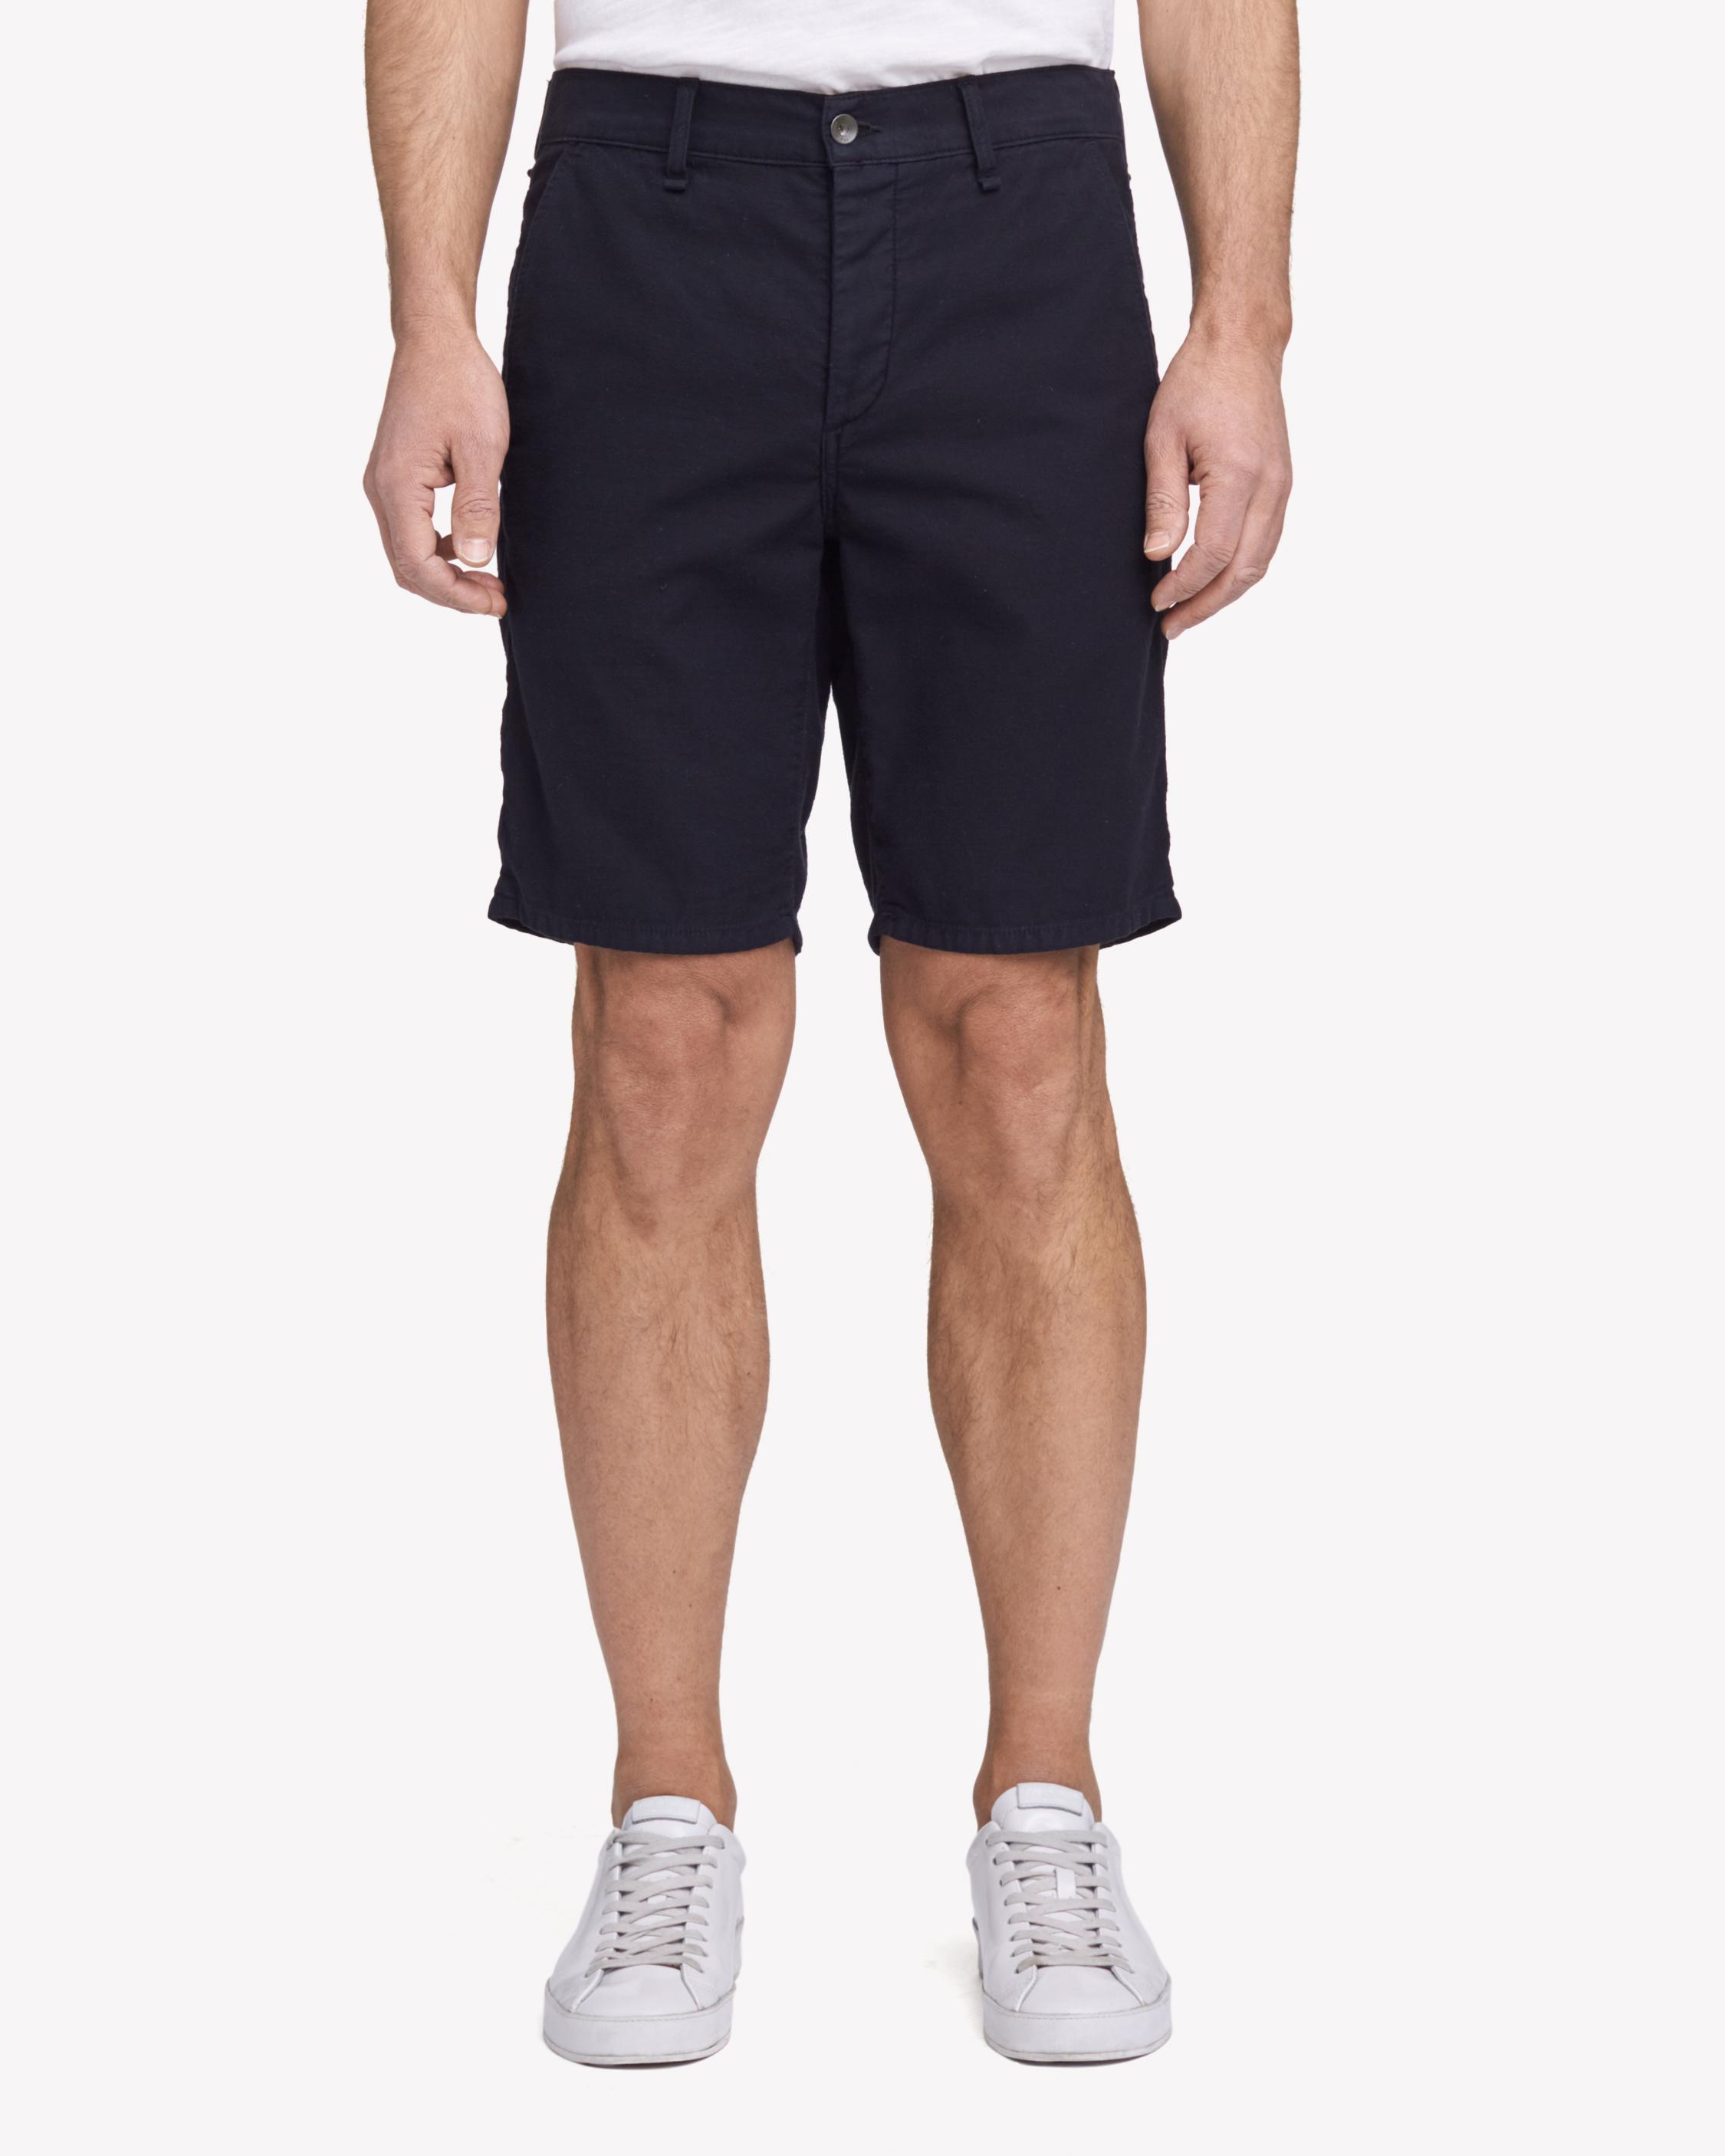 Rag & Bone Classic Chino Shorts Closeup